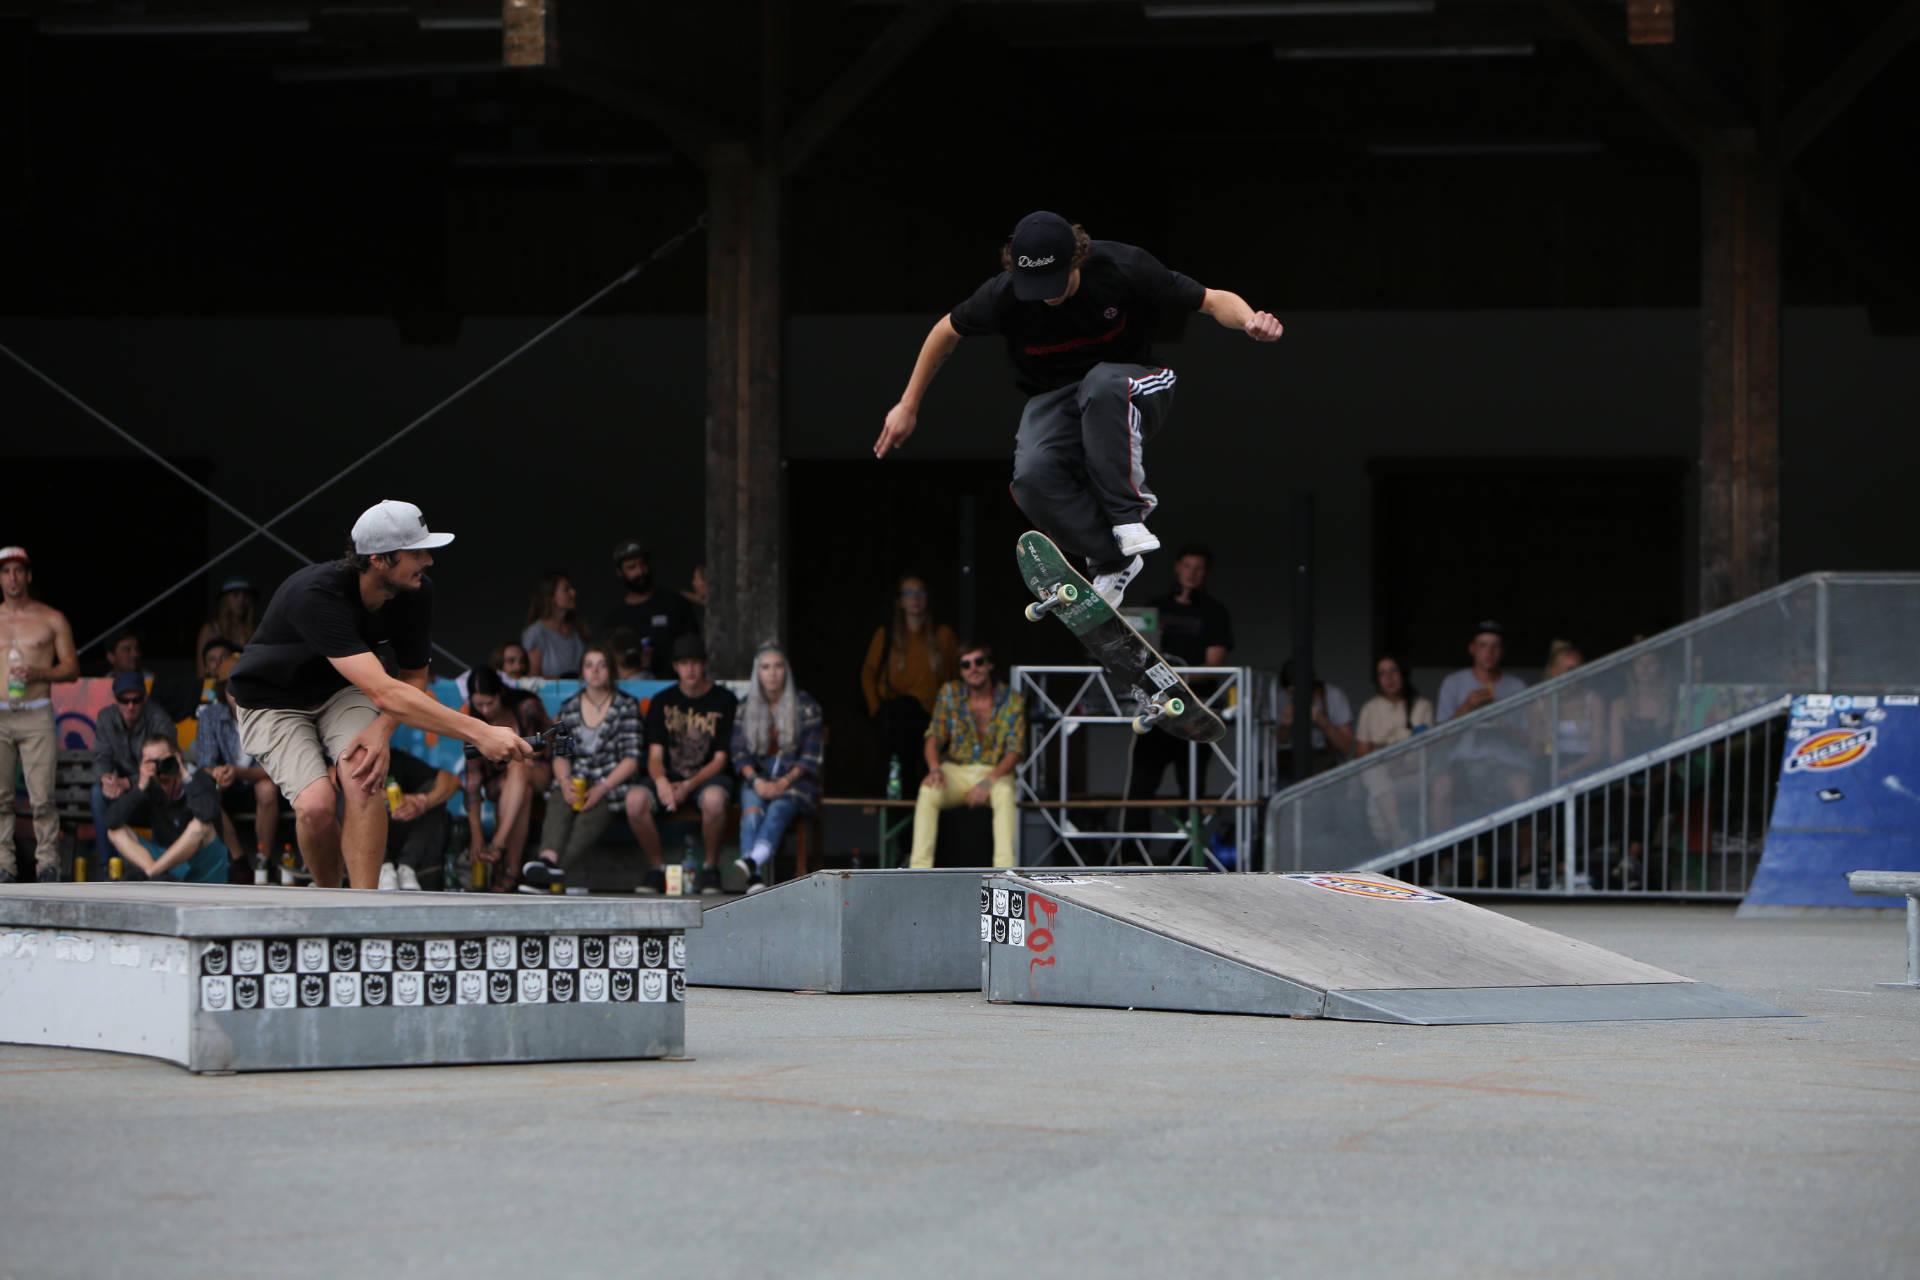 skateboardheadz fieberbrunn kgt 2019 finale 00089